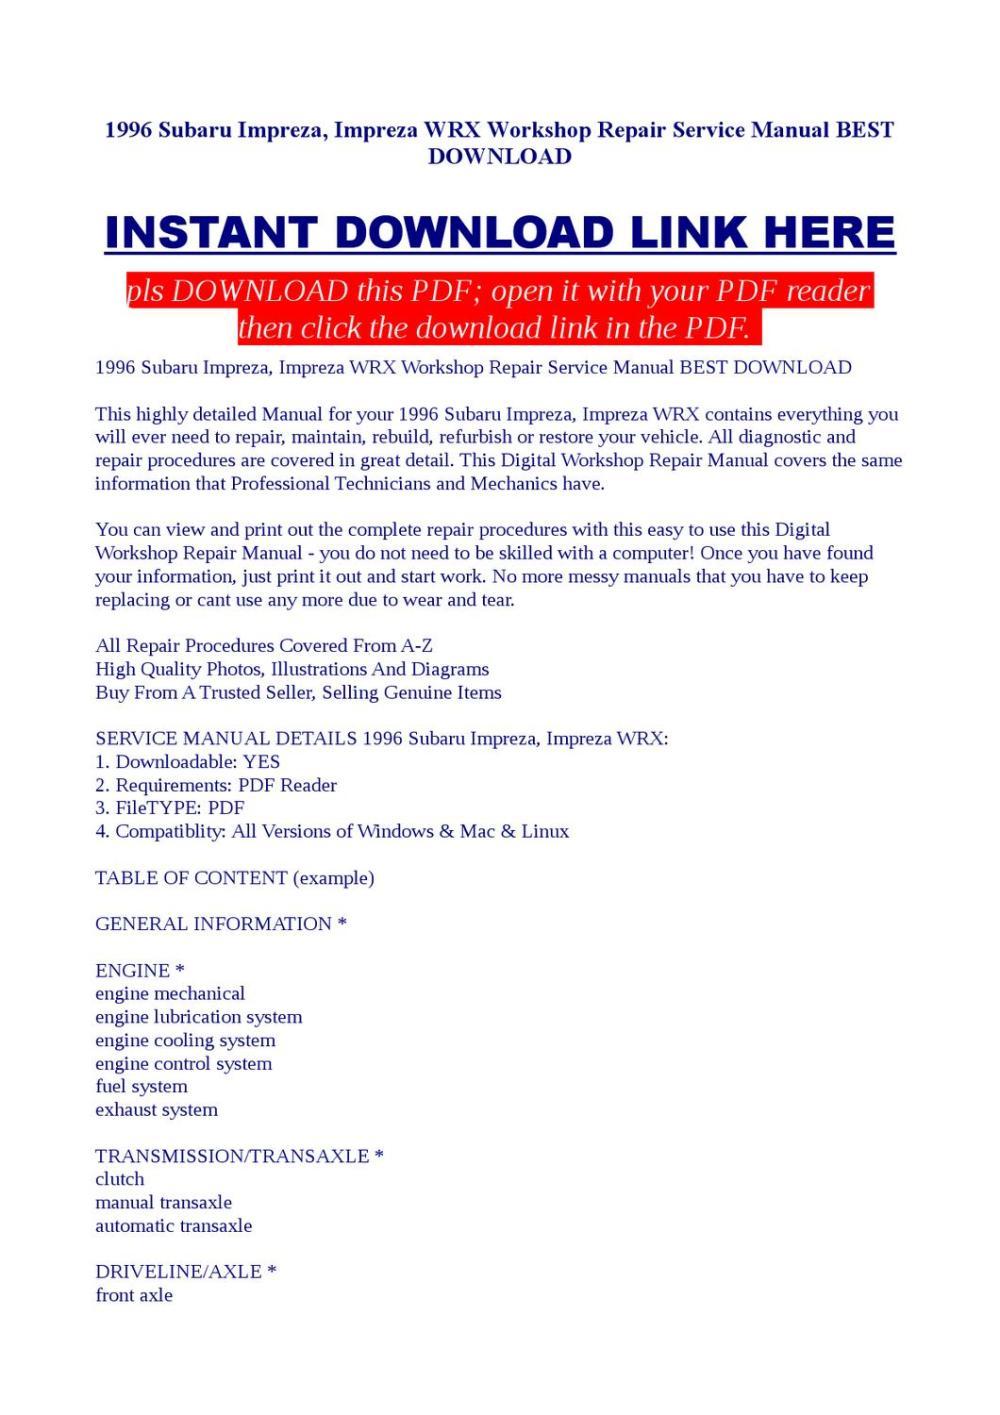 medium resolution of 1996 subaru impreza impreza wrx workshop repair service manual best download